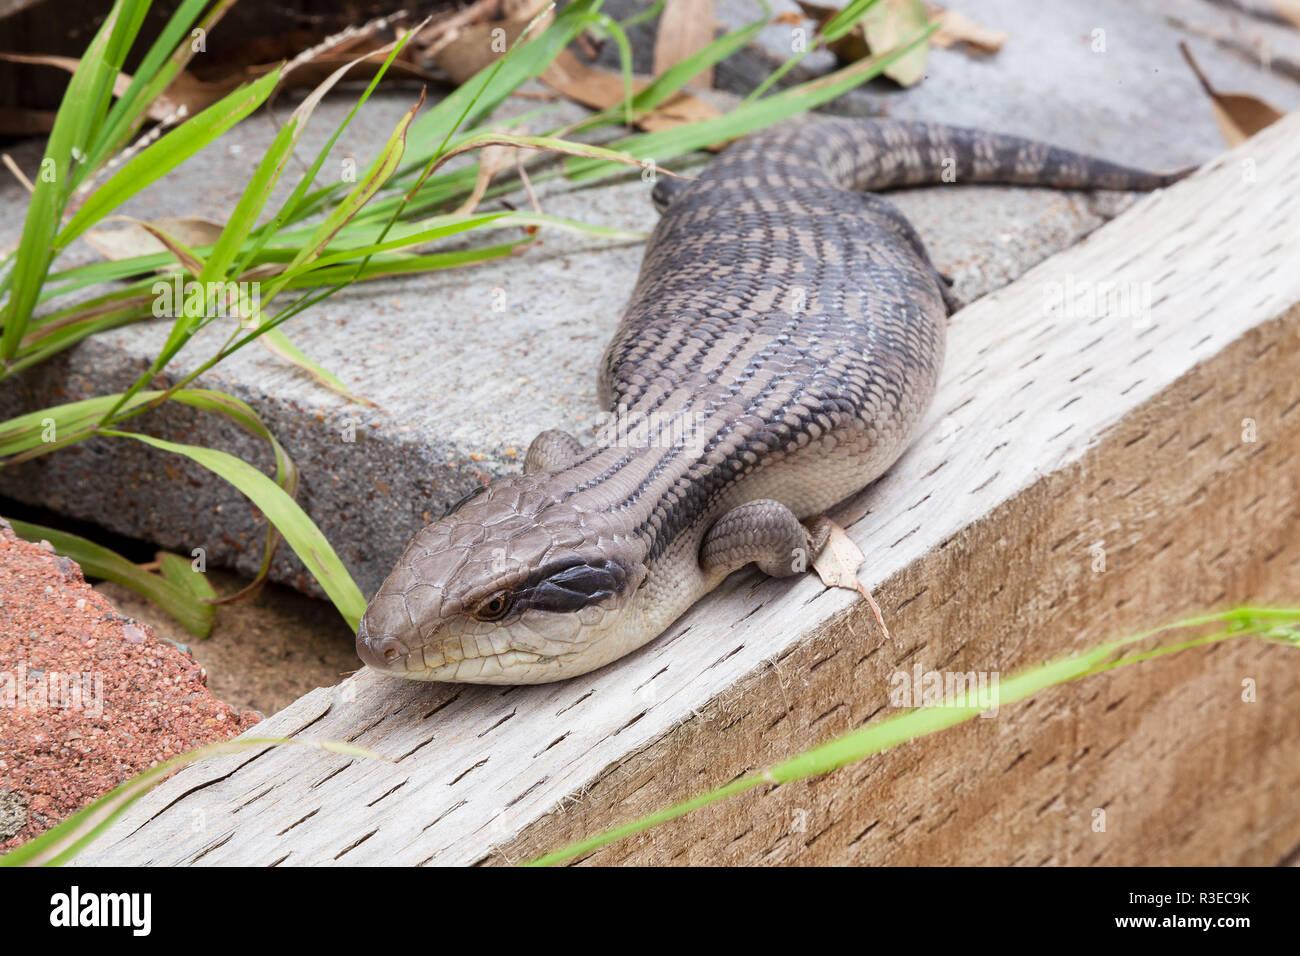 Australian Eastern Blue Tongue Lizard closeup in natural outdoor environment seeking food and shelter - Stock Image